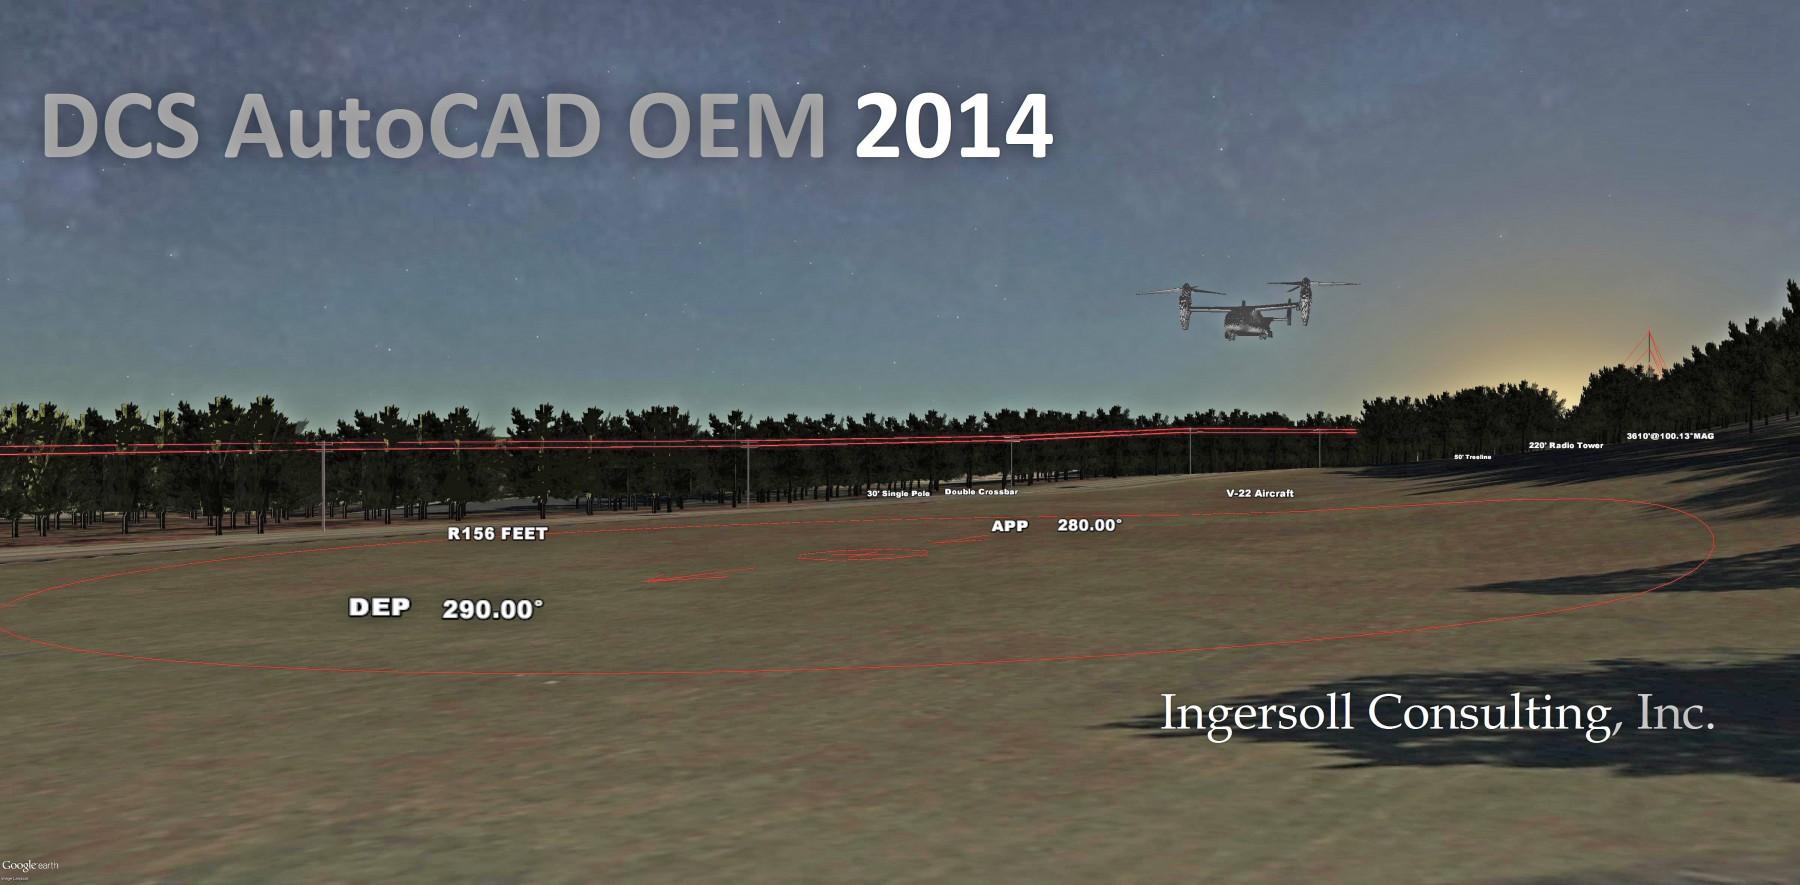 DCS AutoCAD OEM 2014